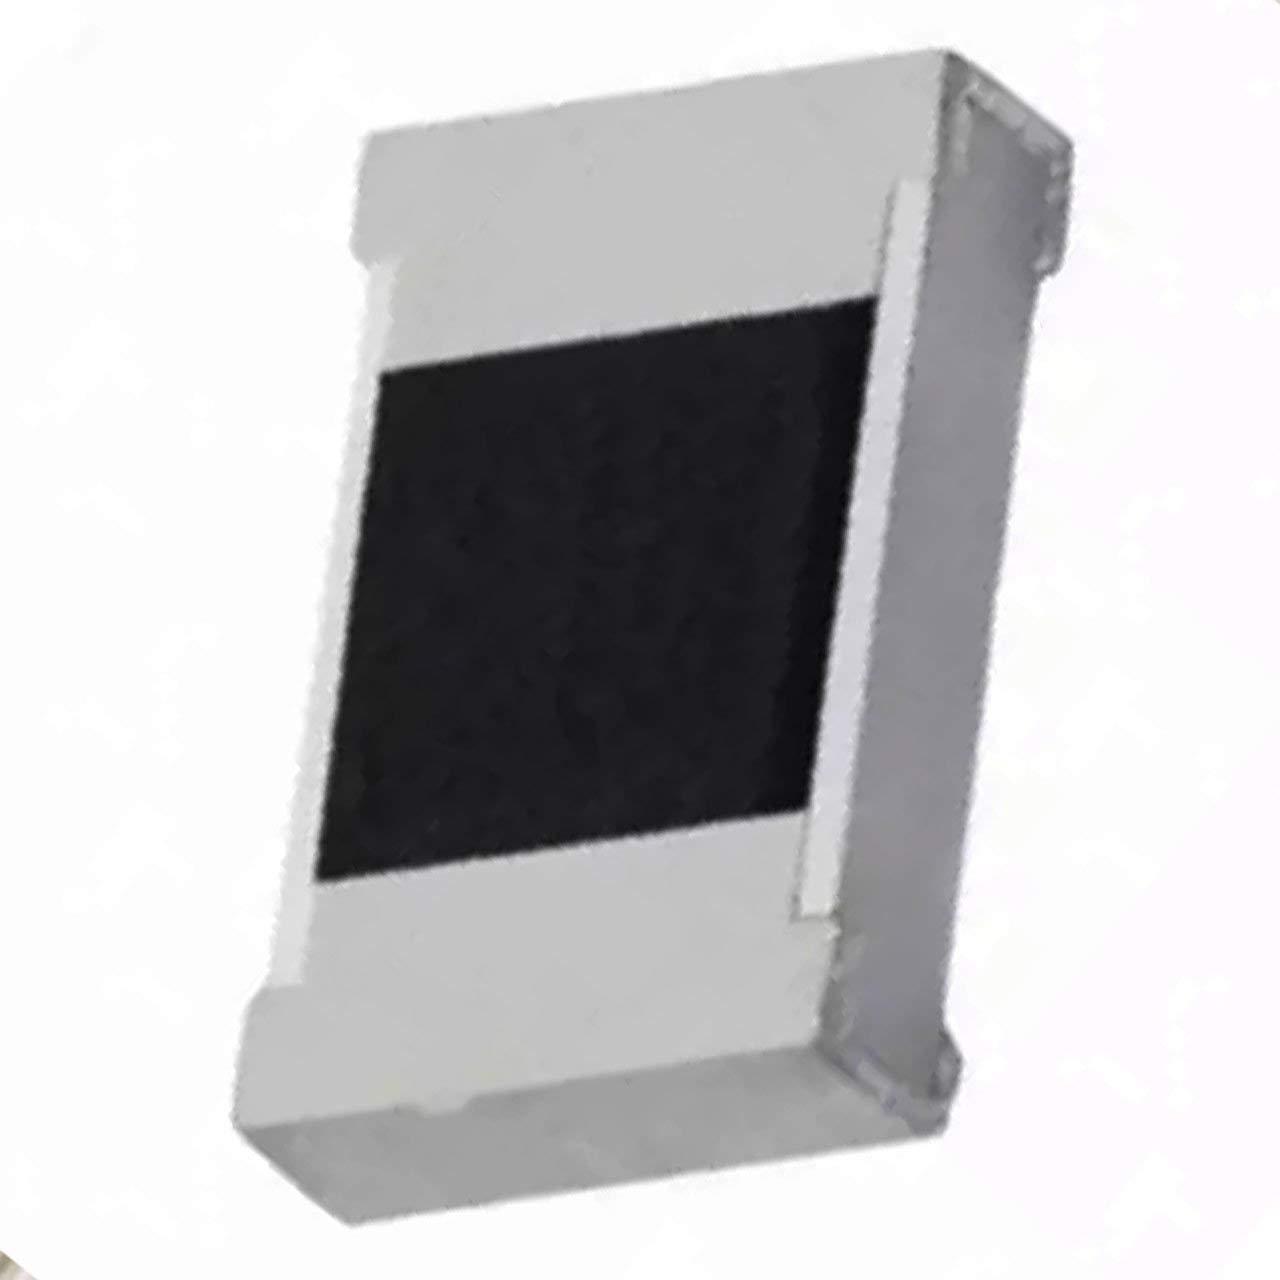 1 piece SMD 1//4watt 1ohms 1/% 200ppm Thick Film Resistors